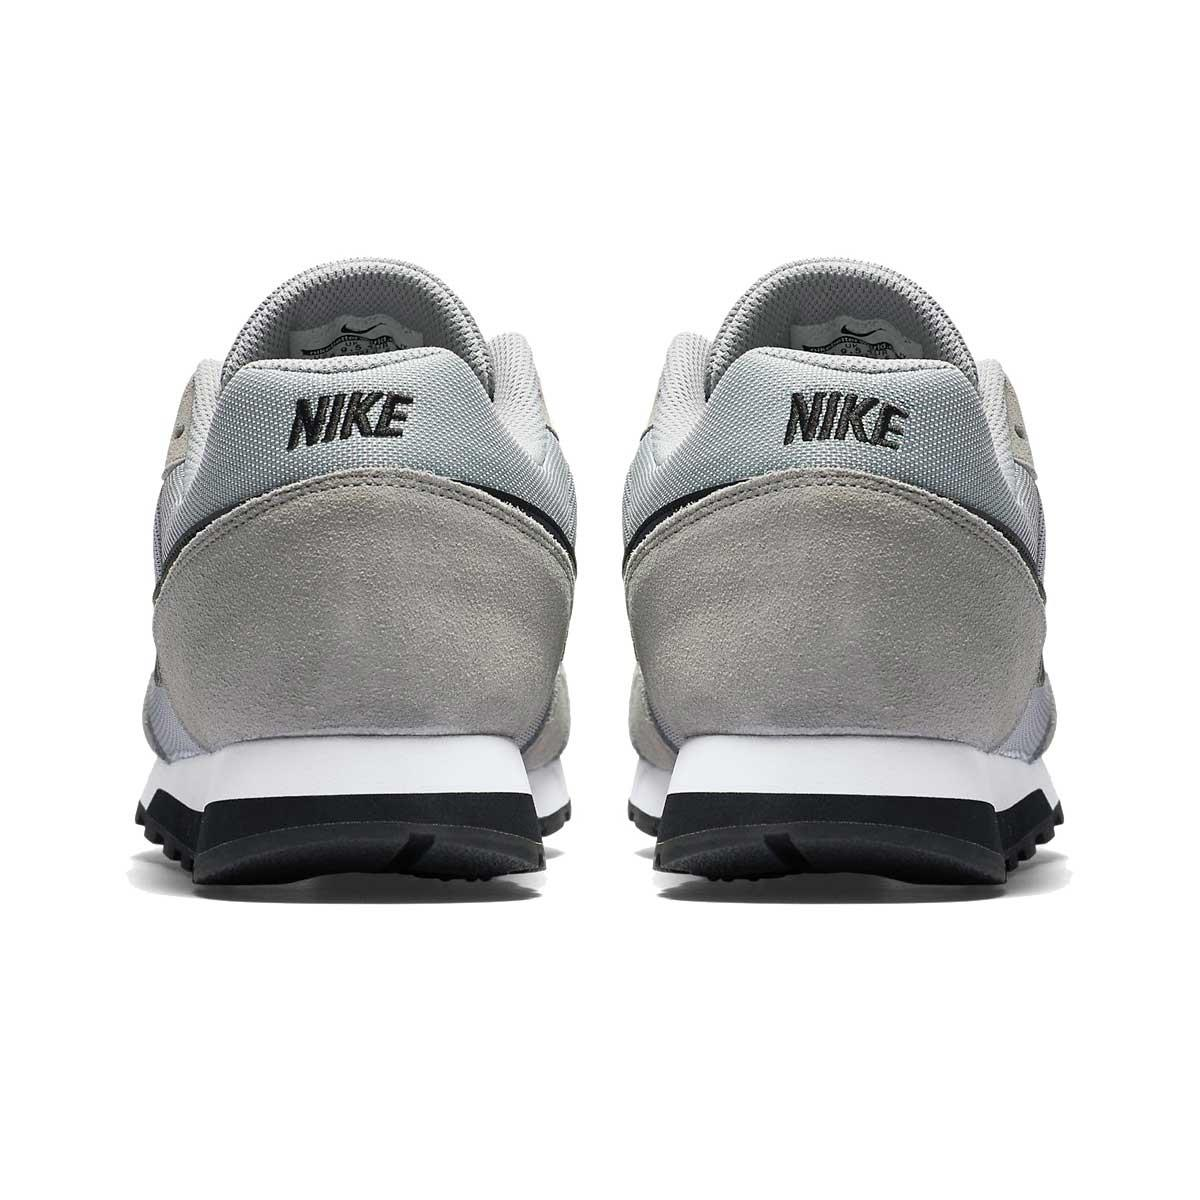 852ef1edcf5cd Tênis Nike Md Runner 2 Masculino